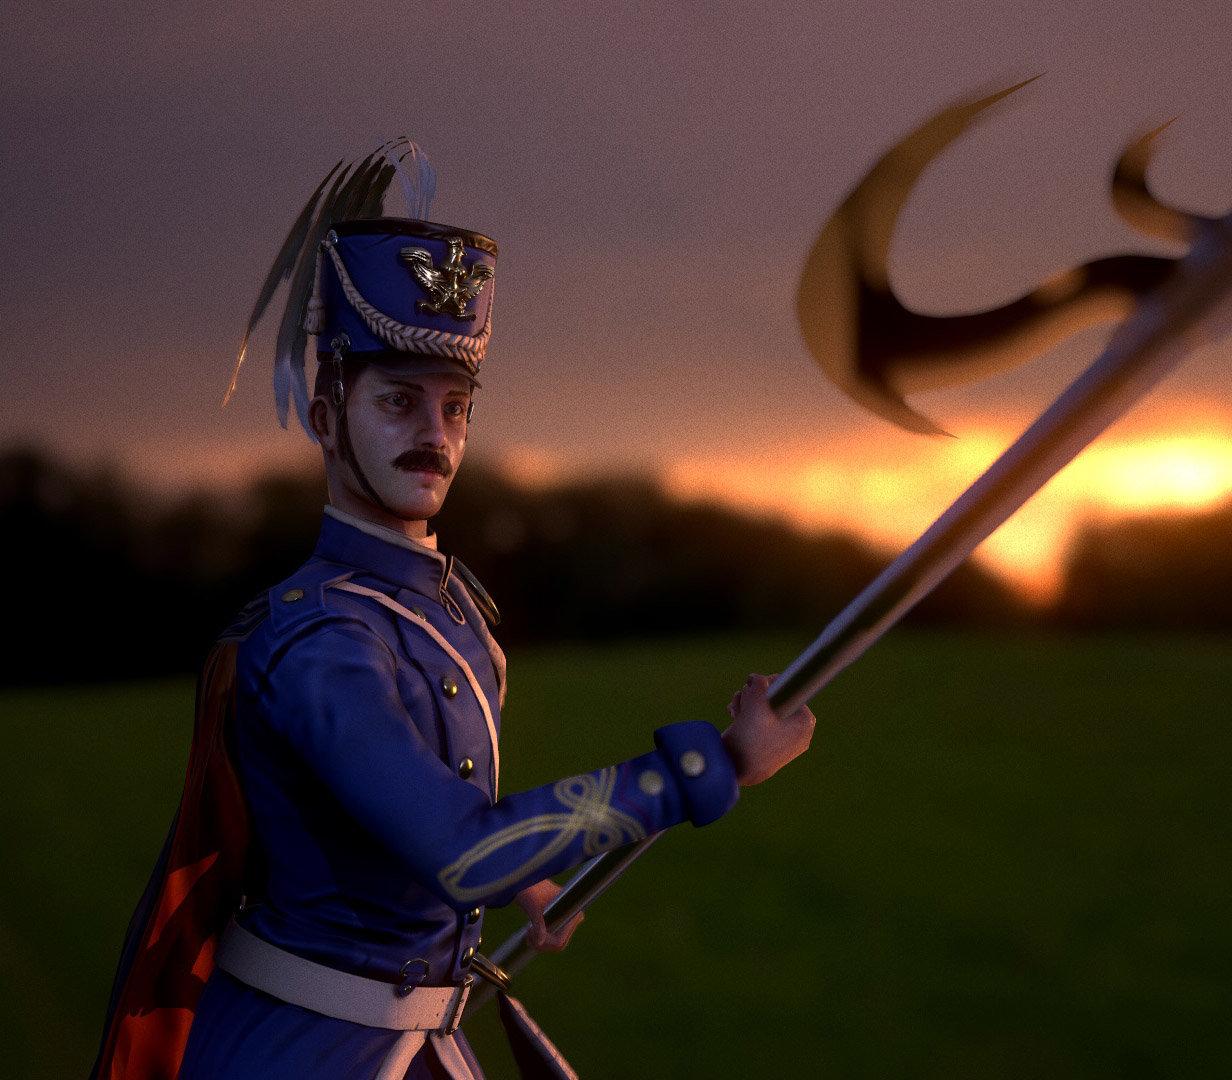 Luis santander soldier 2